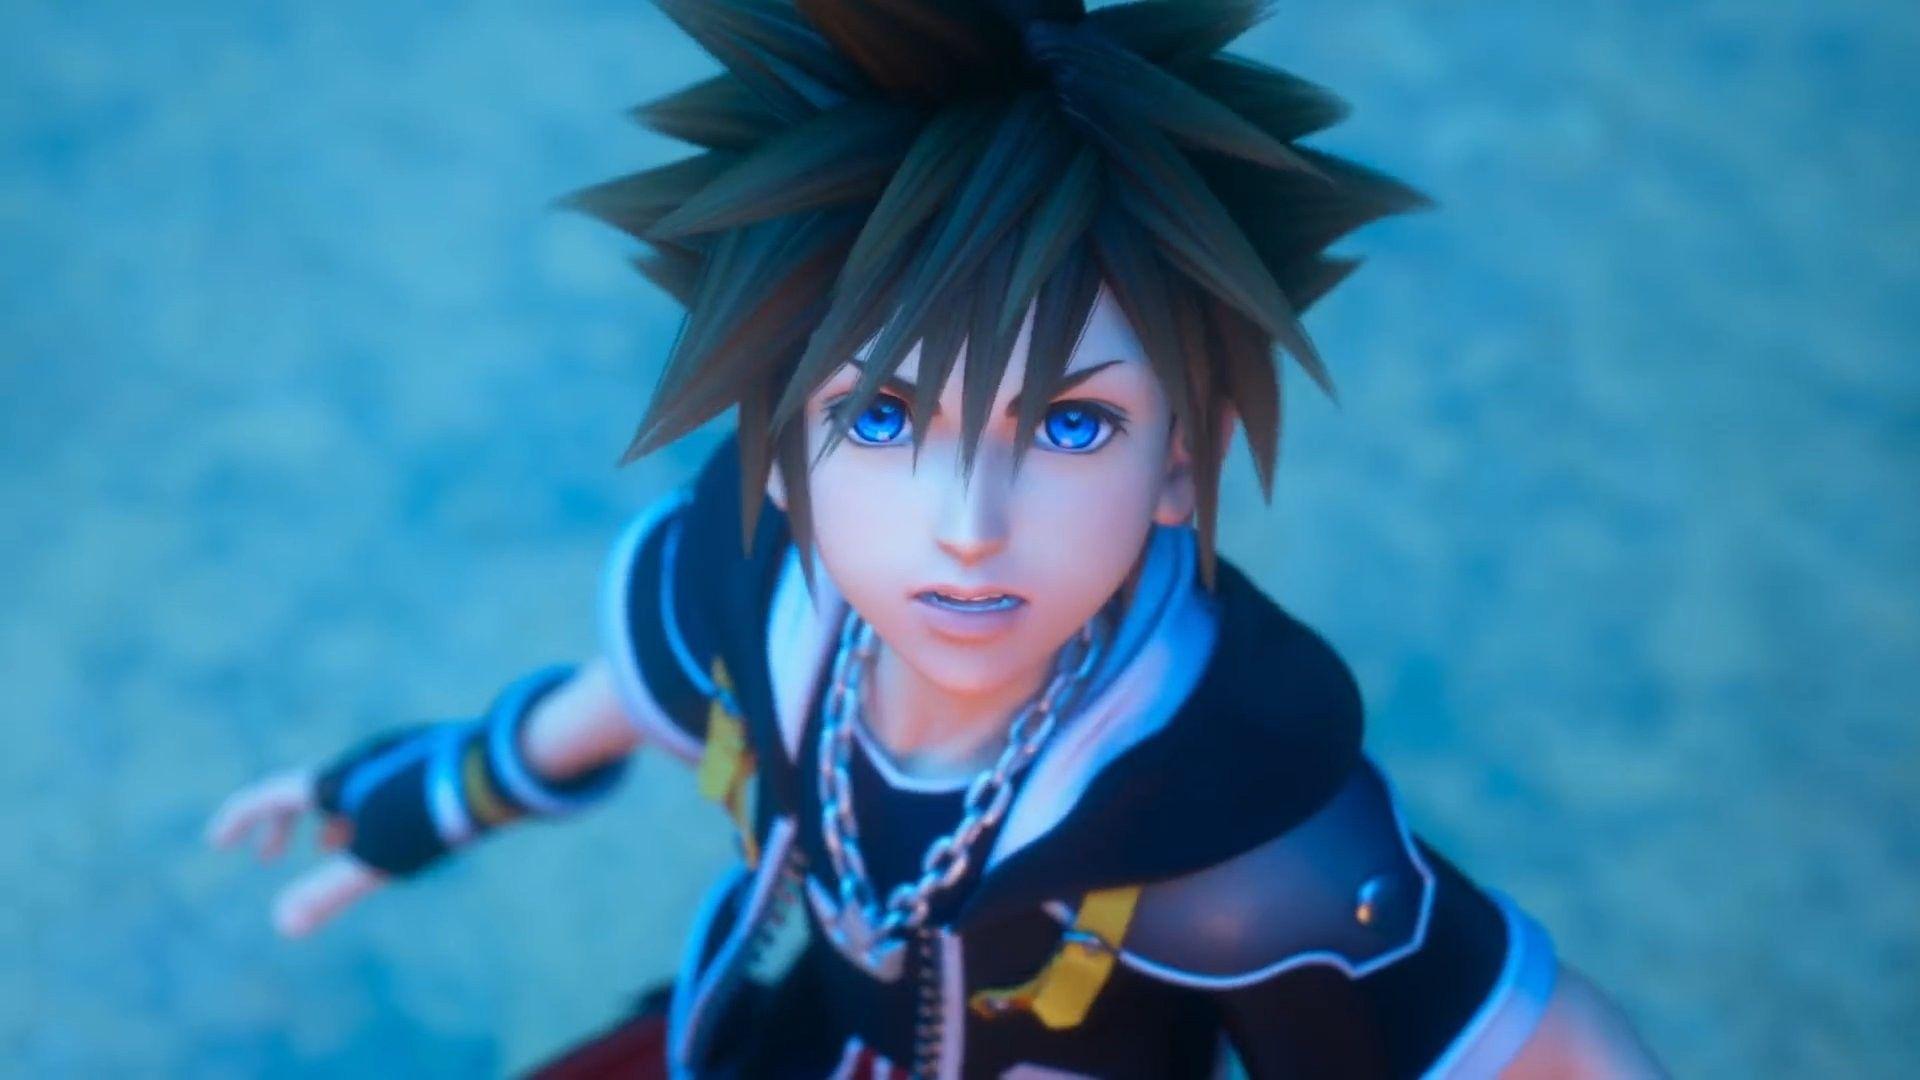 Pin By Chloe Kazama On Kingdom Hearts Kingdom Hearts 3 Kingdom Hearts Kingdom